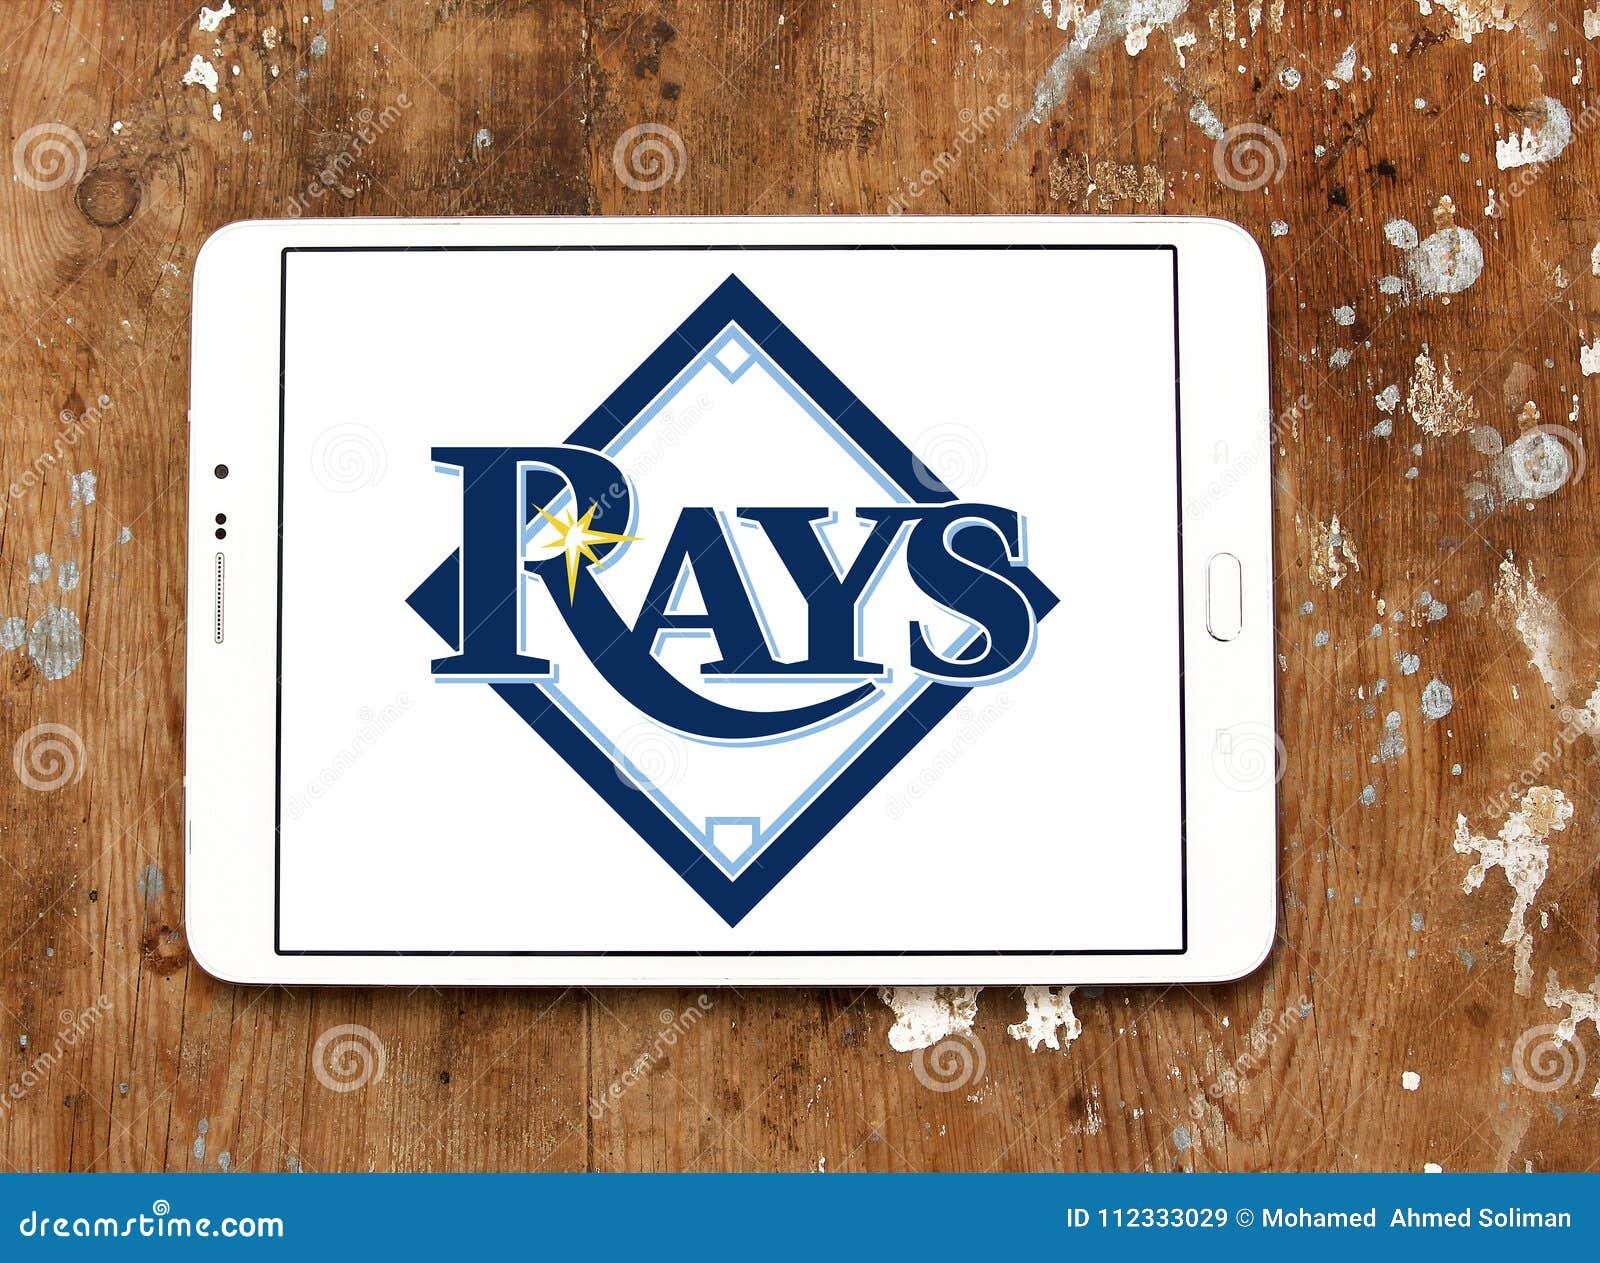 Tampa Bay Rays Baseball Team Logo